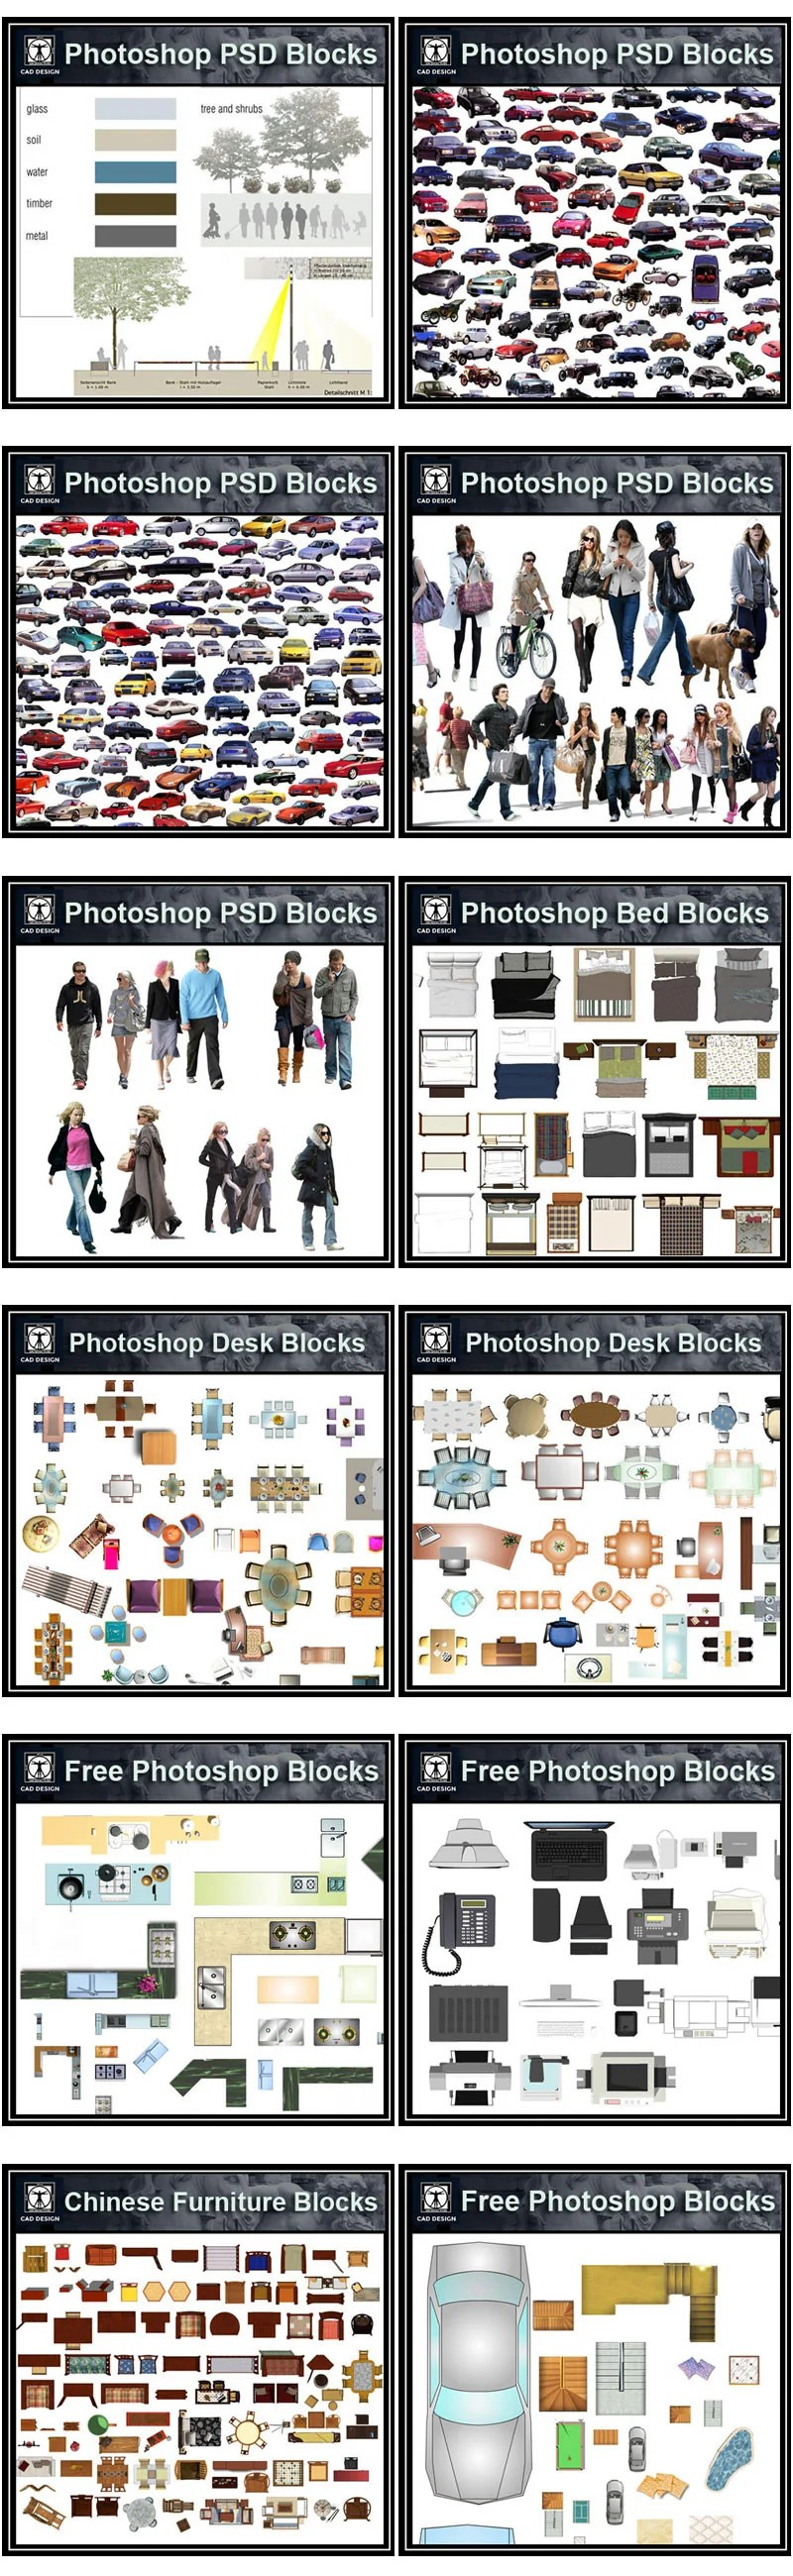 Over 1000 Photoshop PSD Blocks Bundle